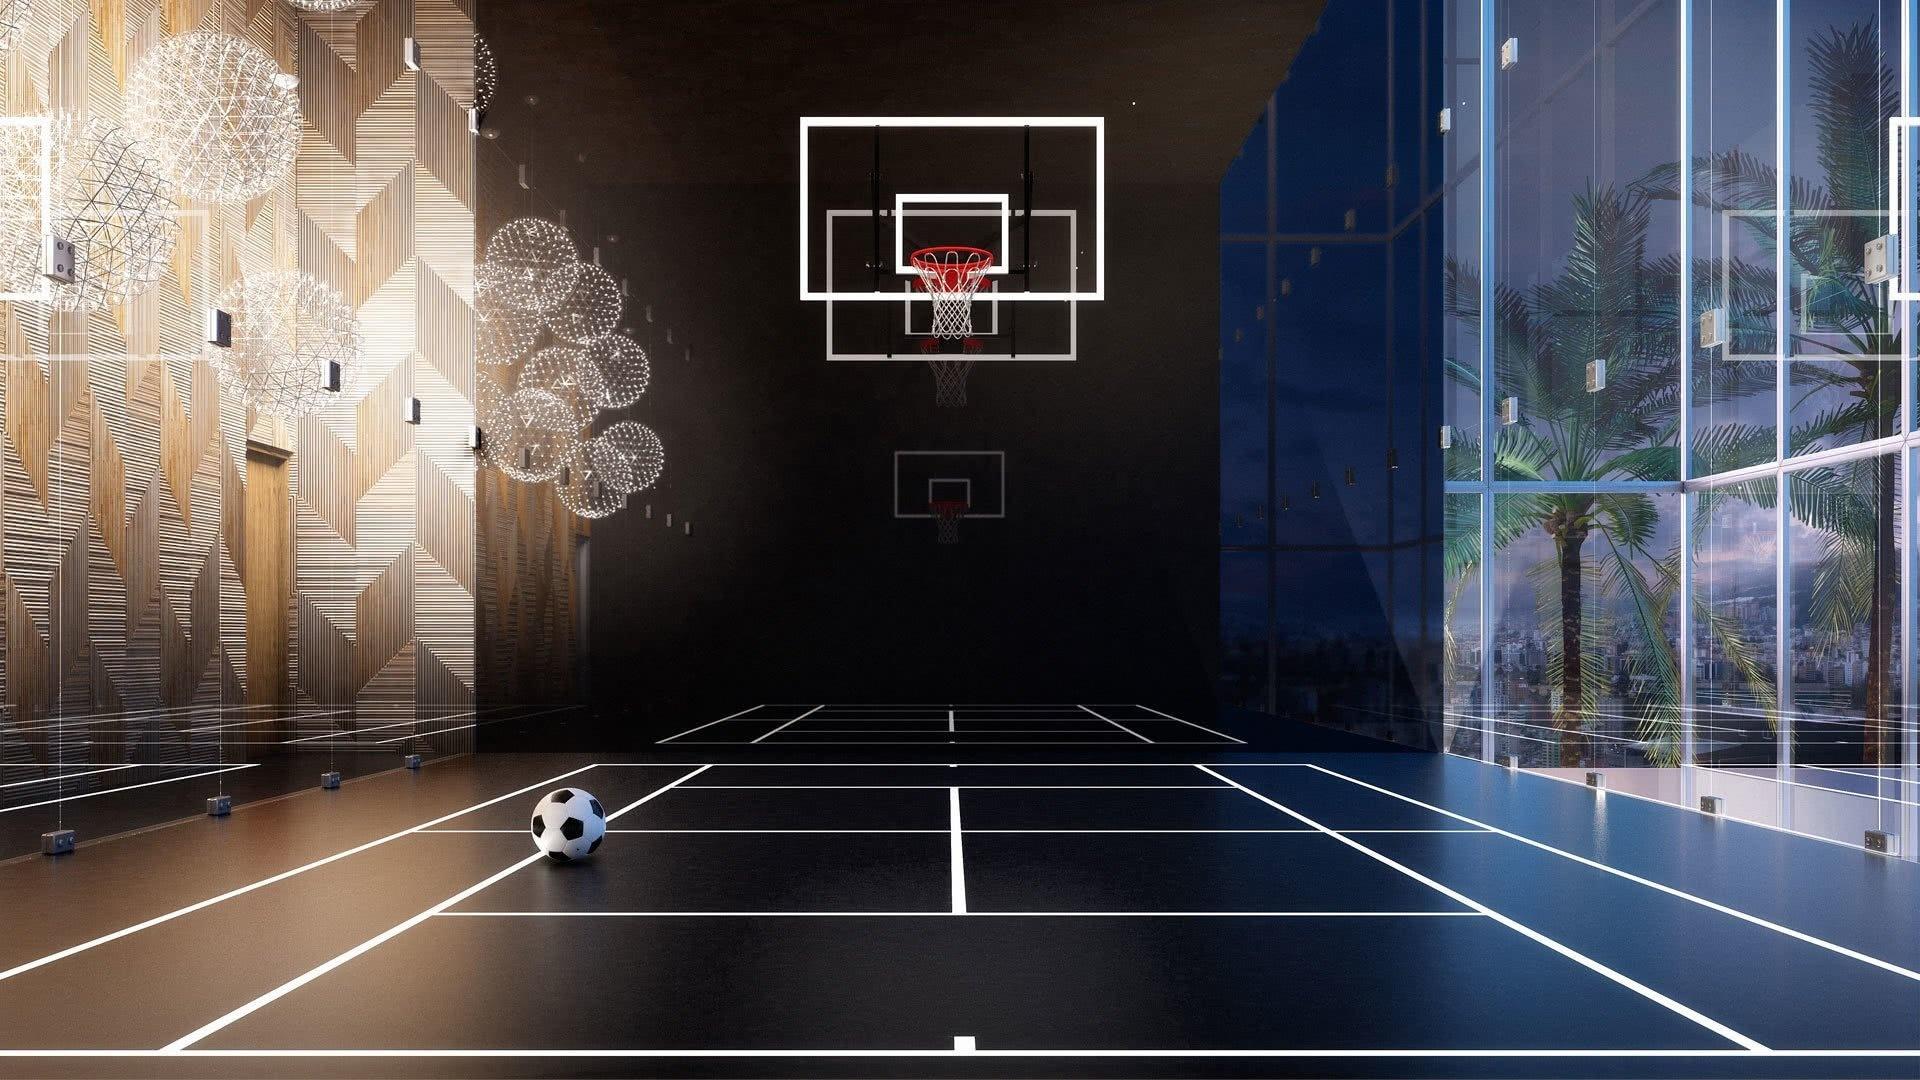 Basketball free image